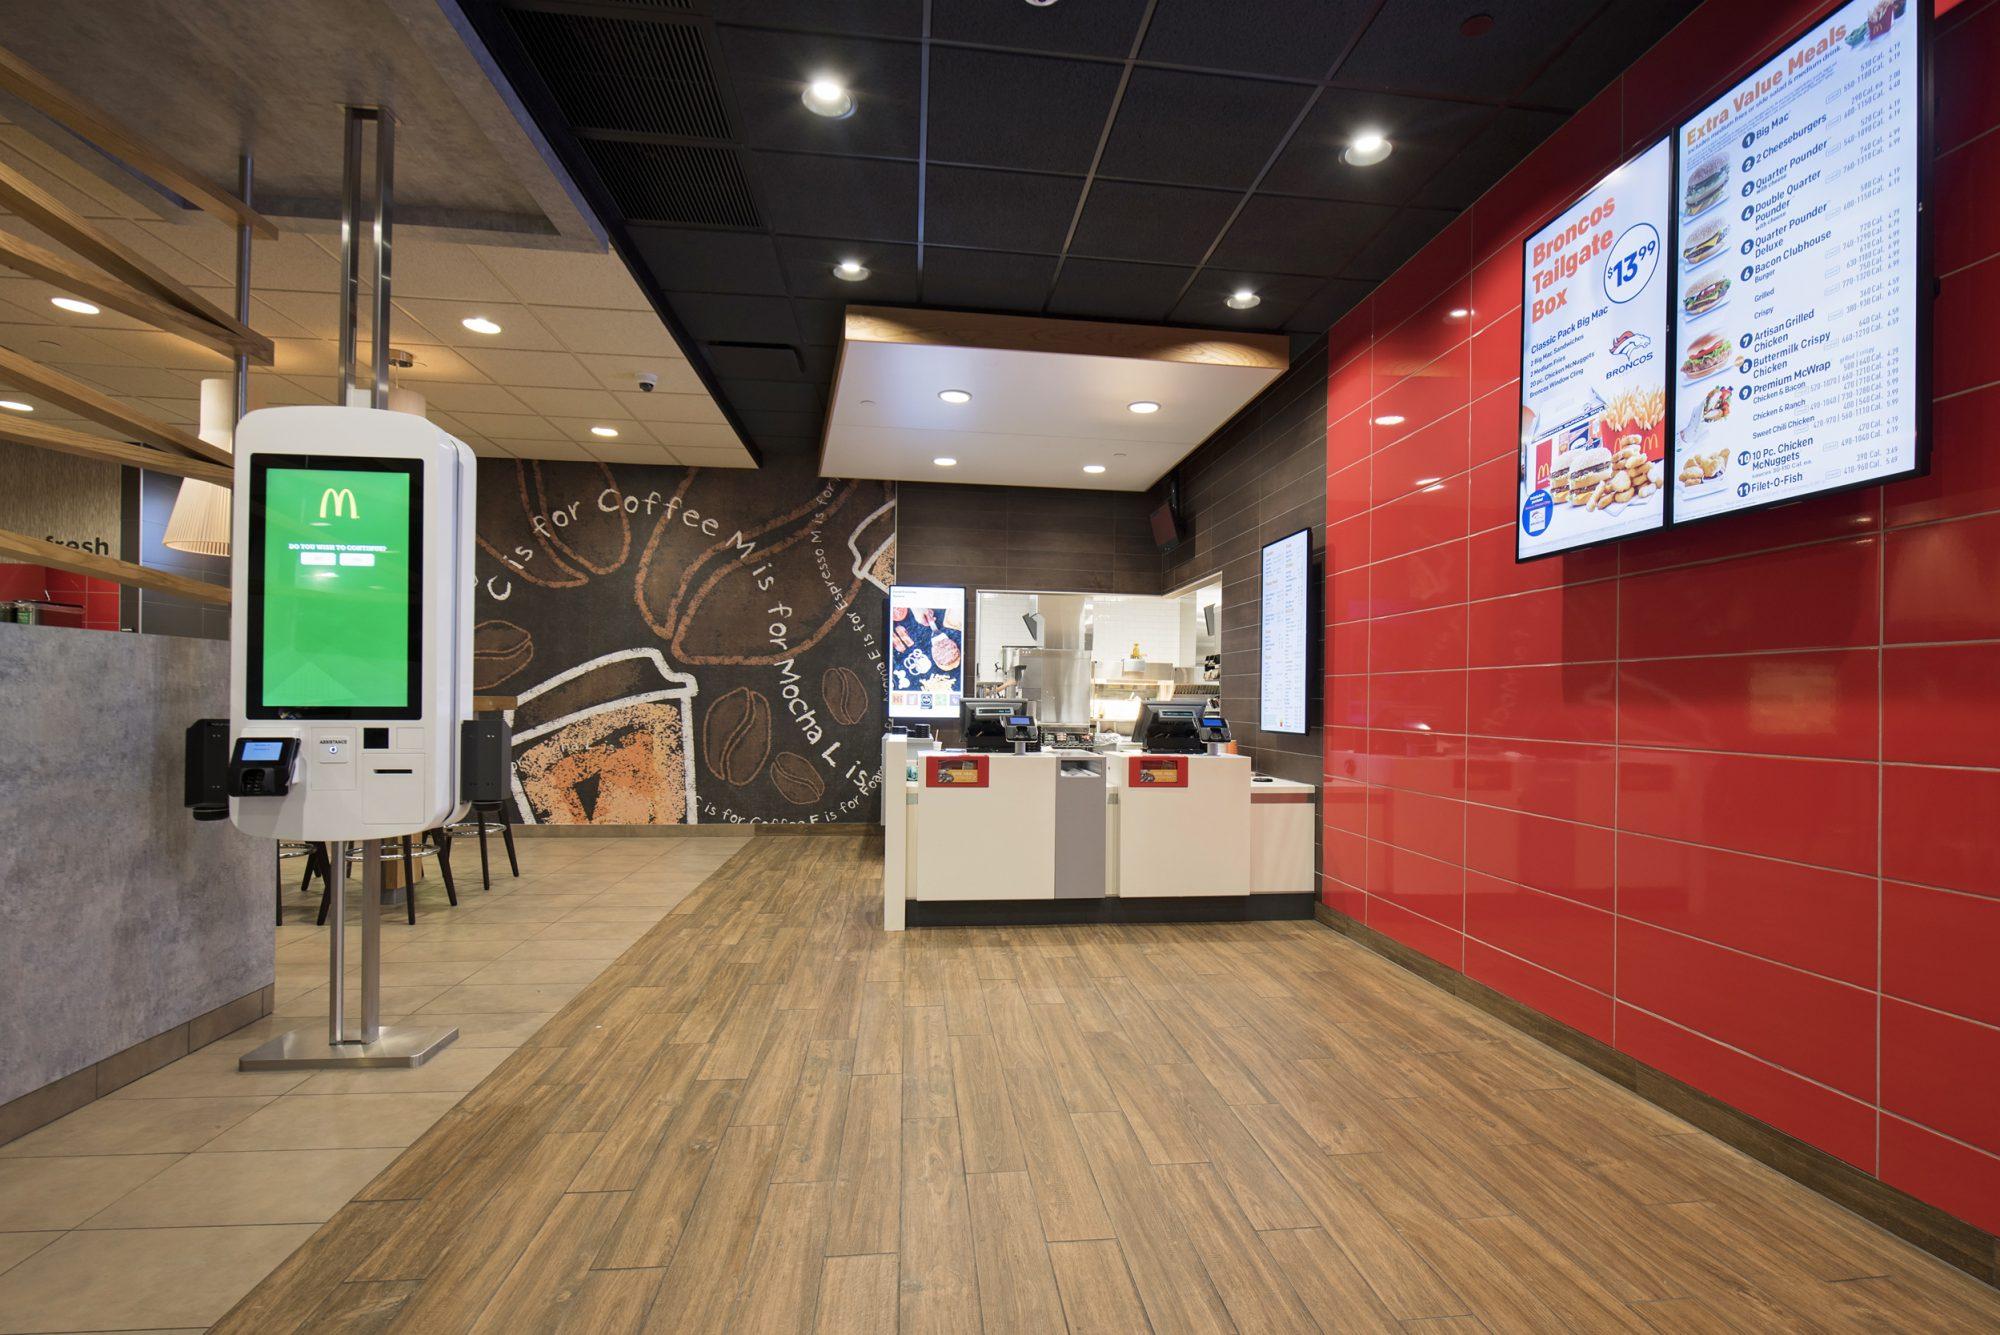 McDonaldsJustForYouInterior_5.jpeg